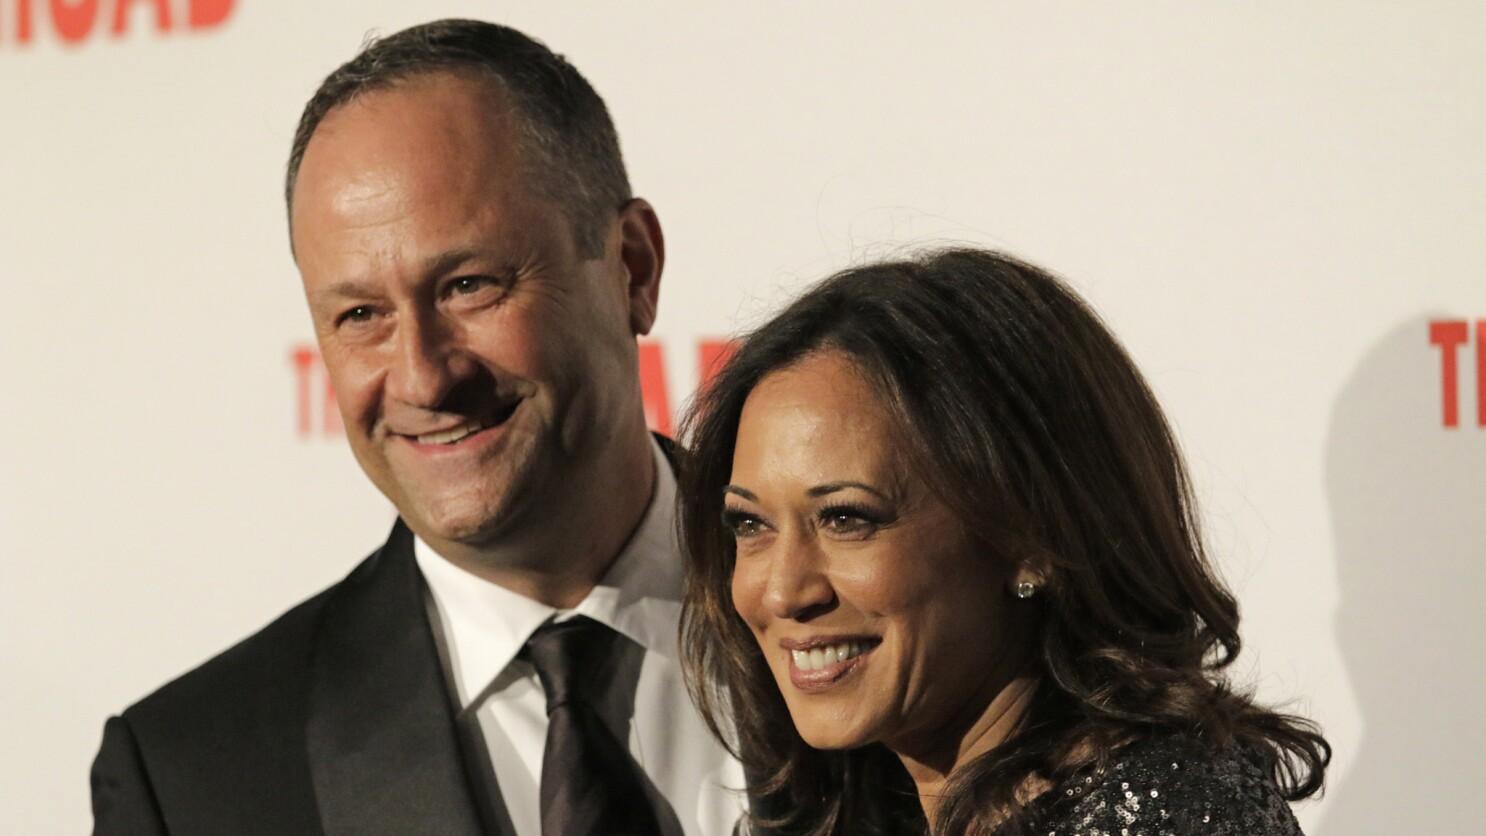 Kamala Harris Husband Doug Emhoff Could Also Make History Los Angeles Times